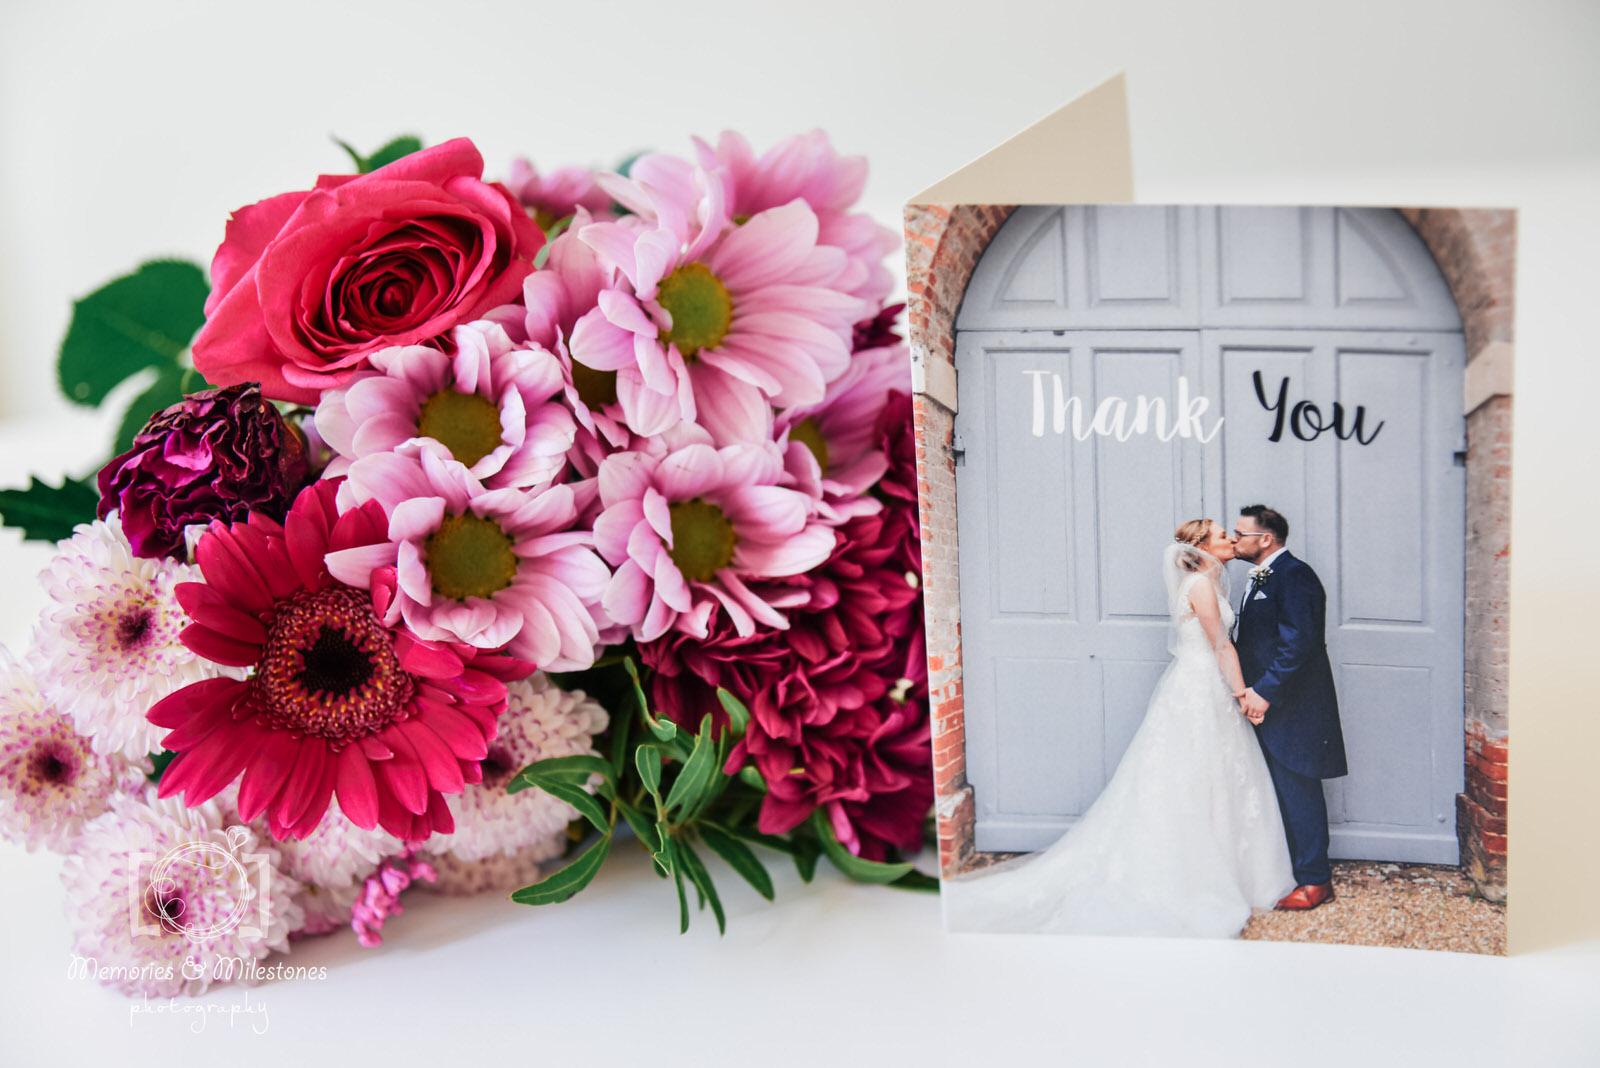 devon wedding photographer reviews